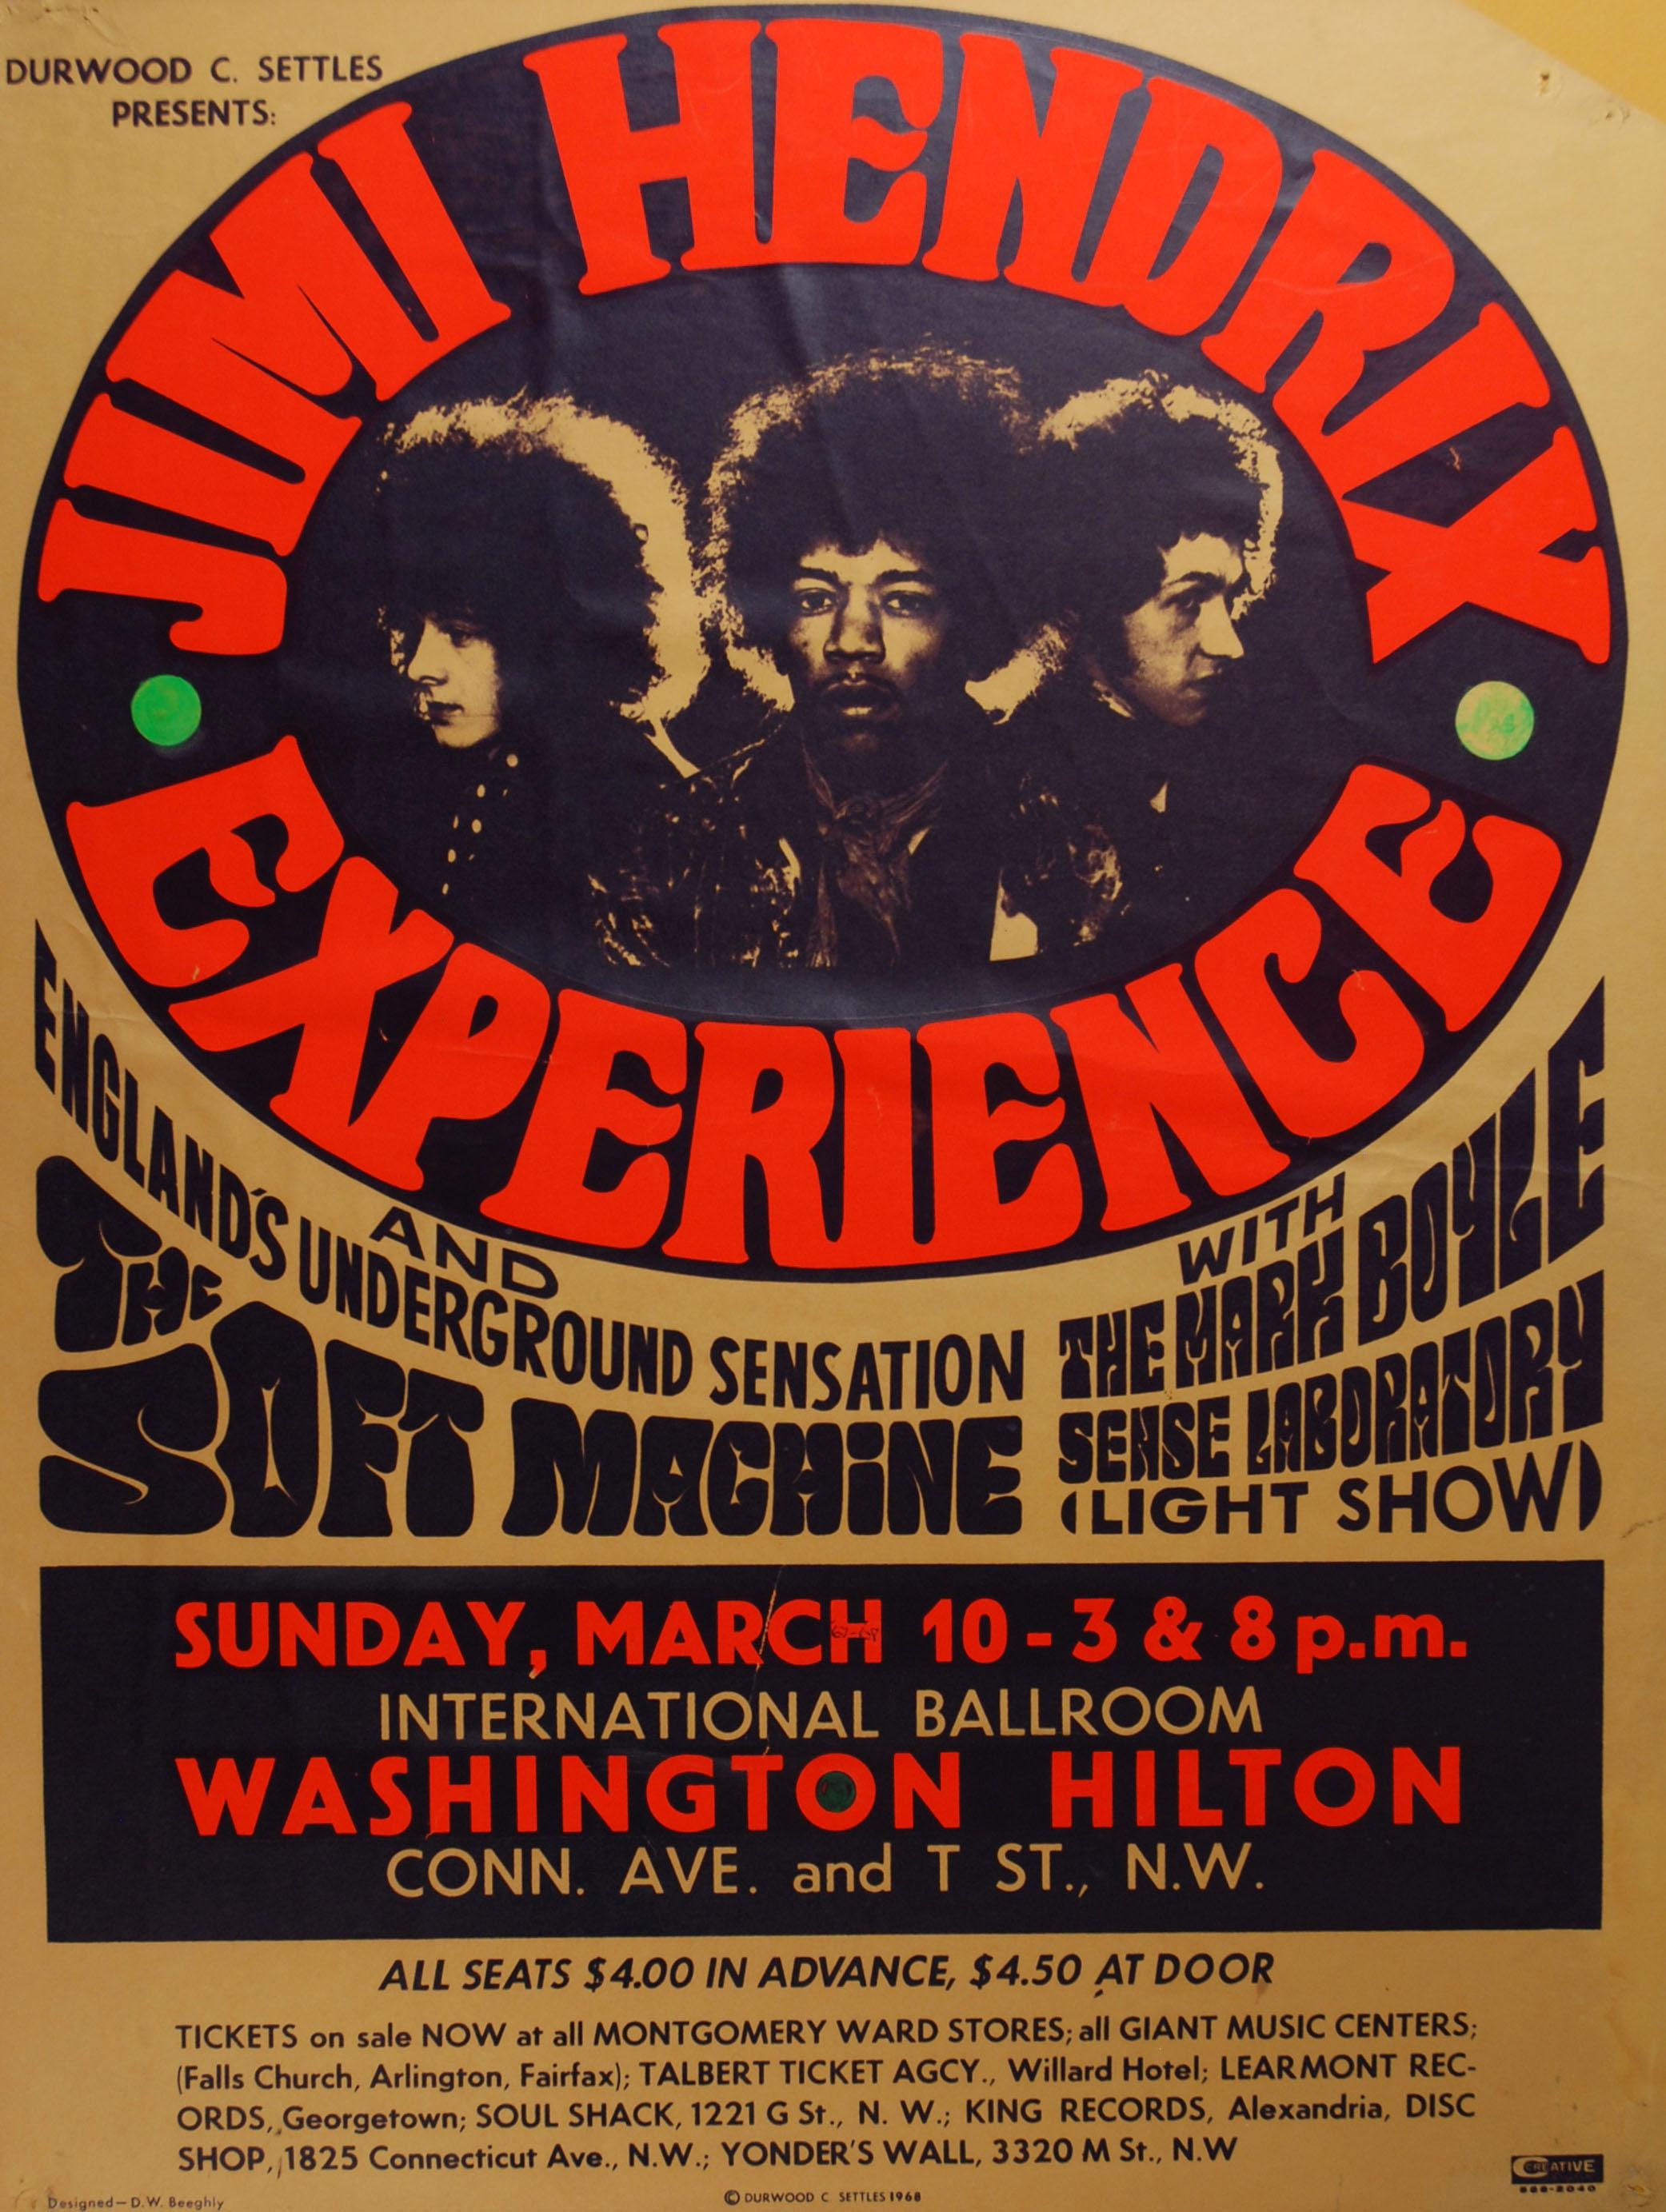 3_10_68 Jimi Hendrix Washington Hilton.jpg